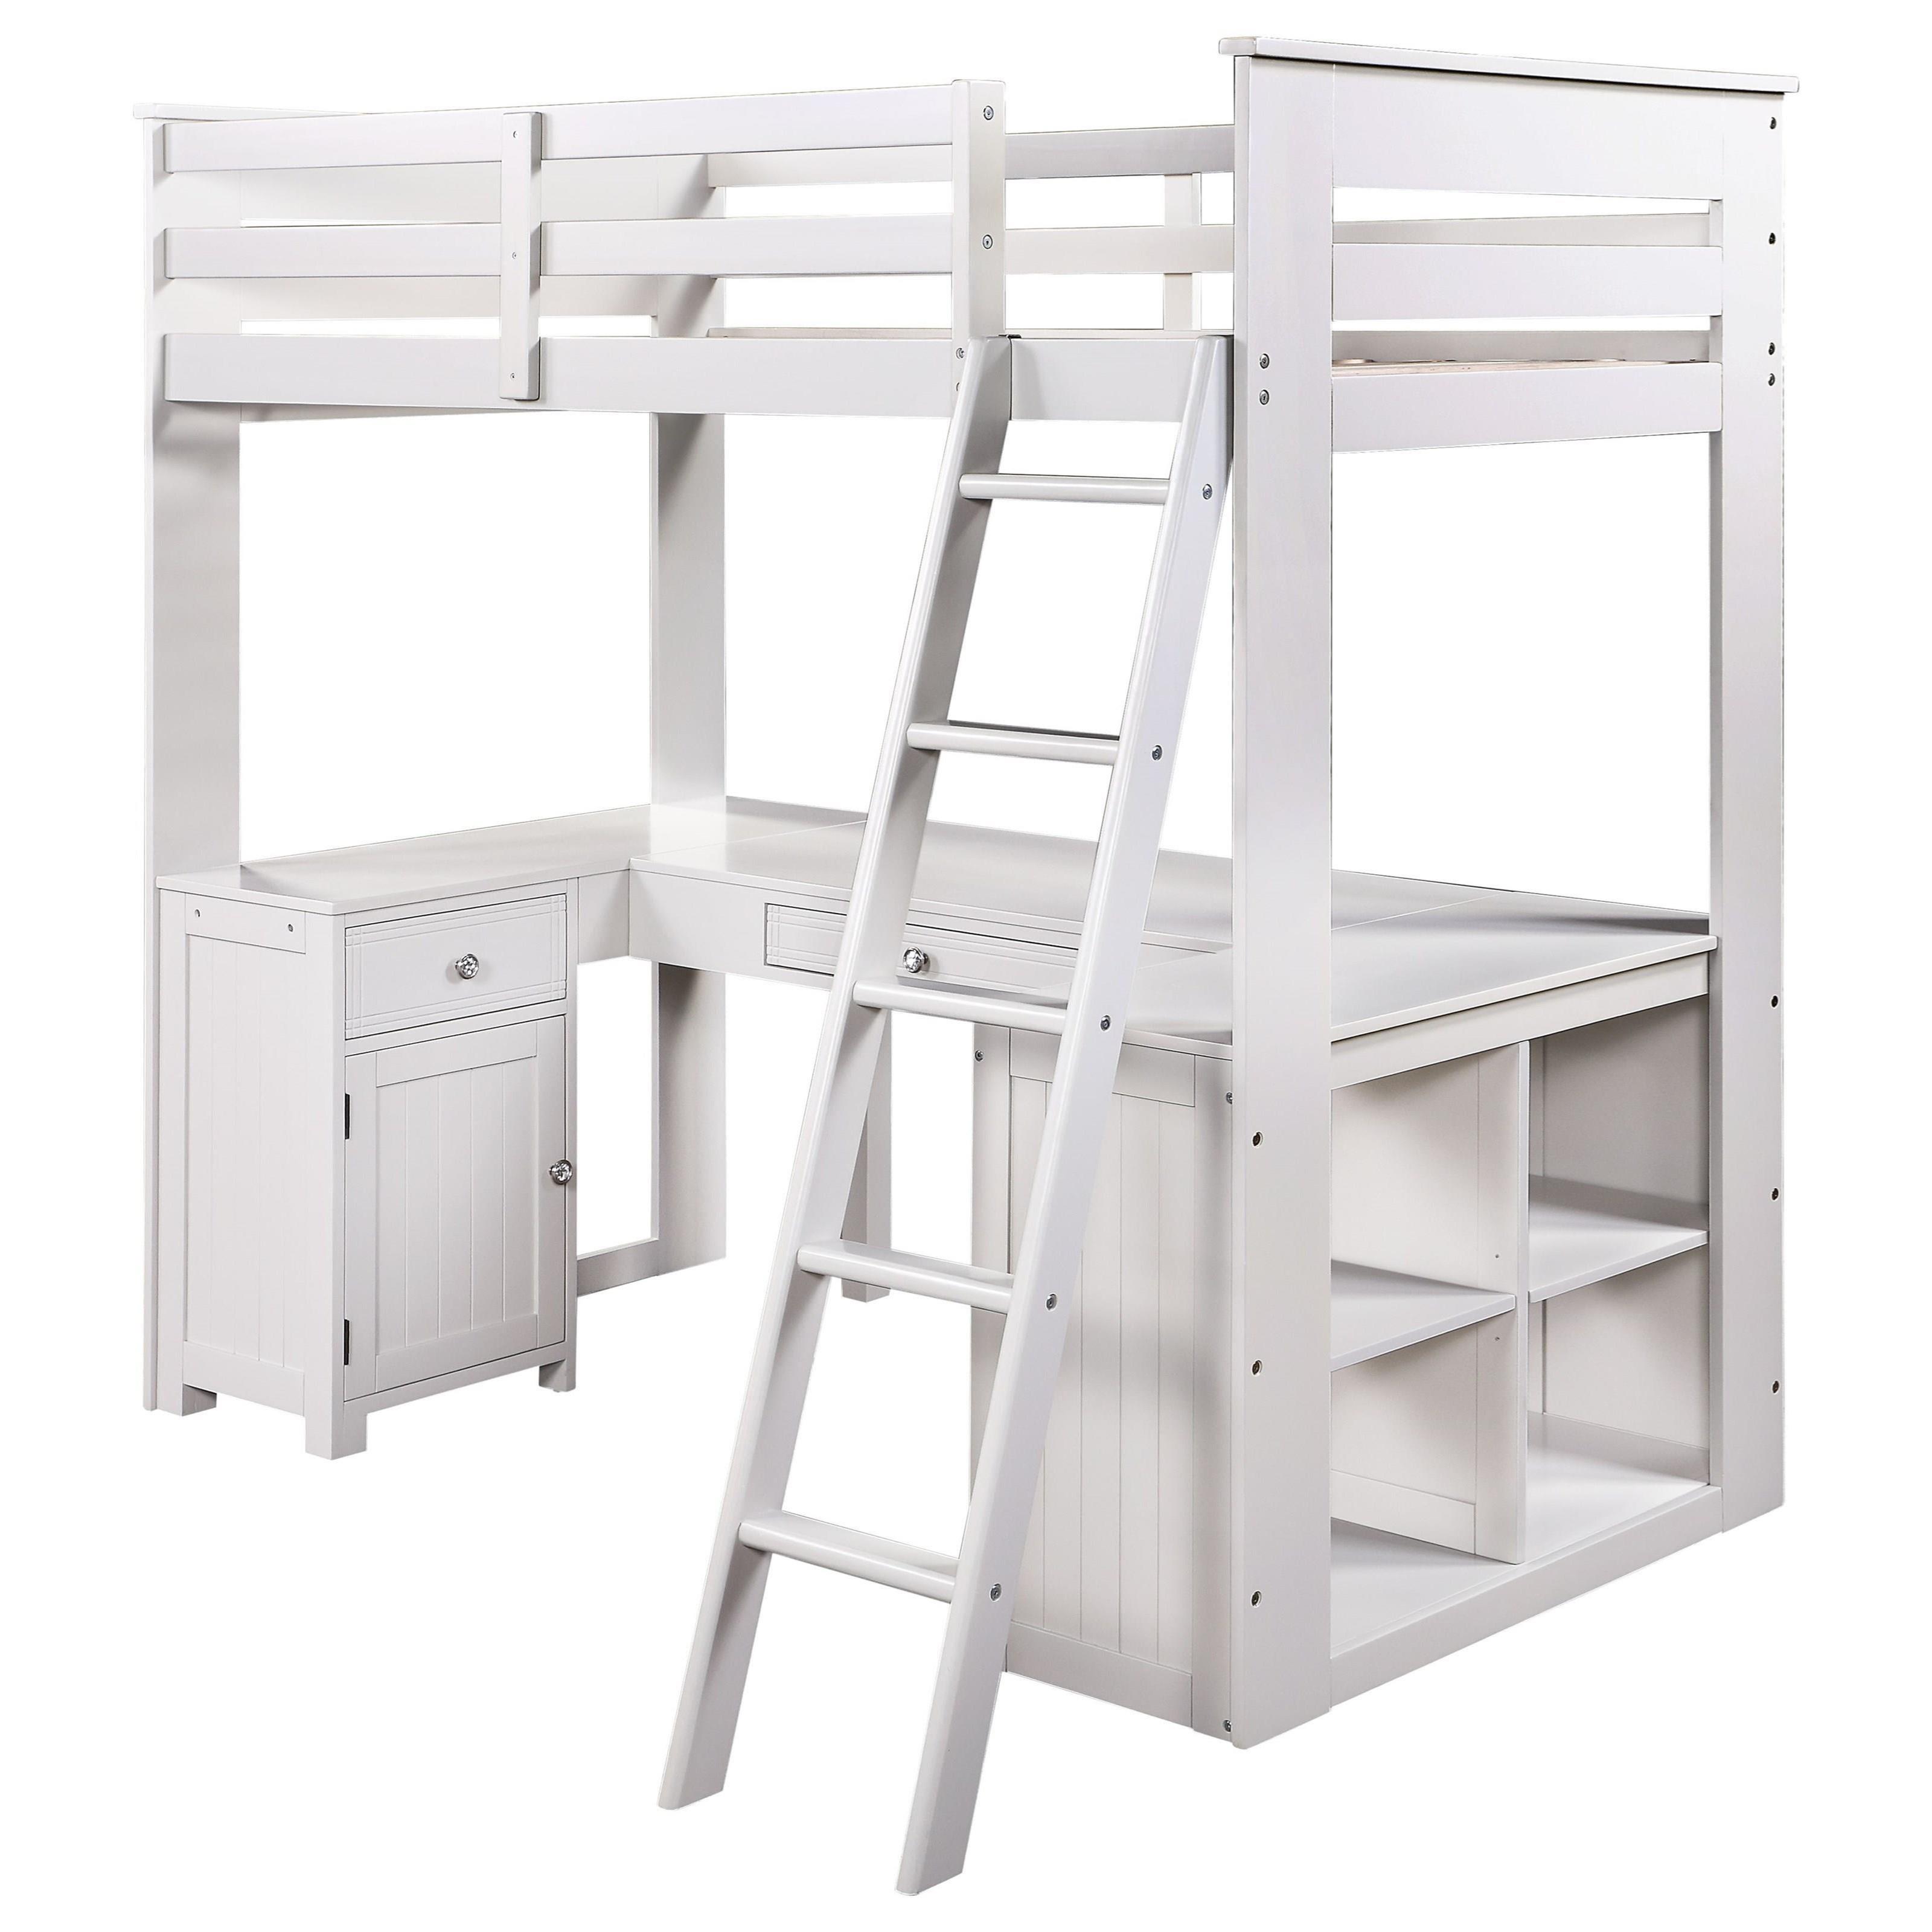 Ambar Loft Bed w/Chest, Desk & Bookcase by Acme Furniture at Carolina Direct